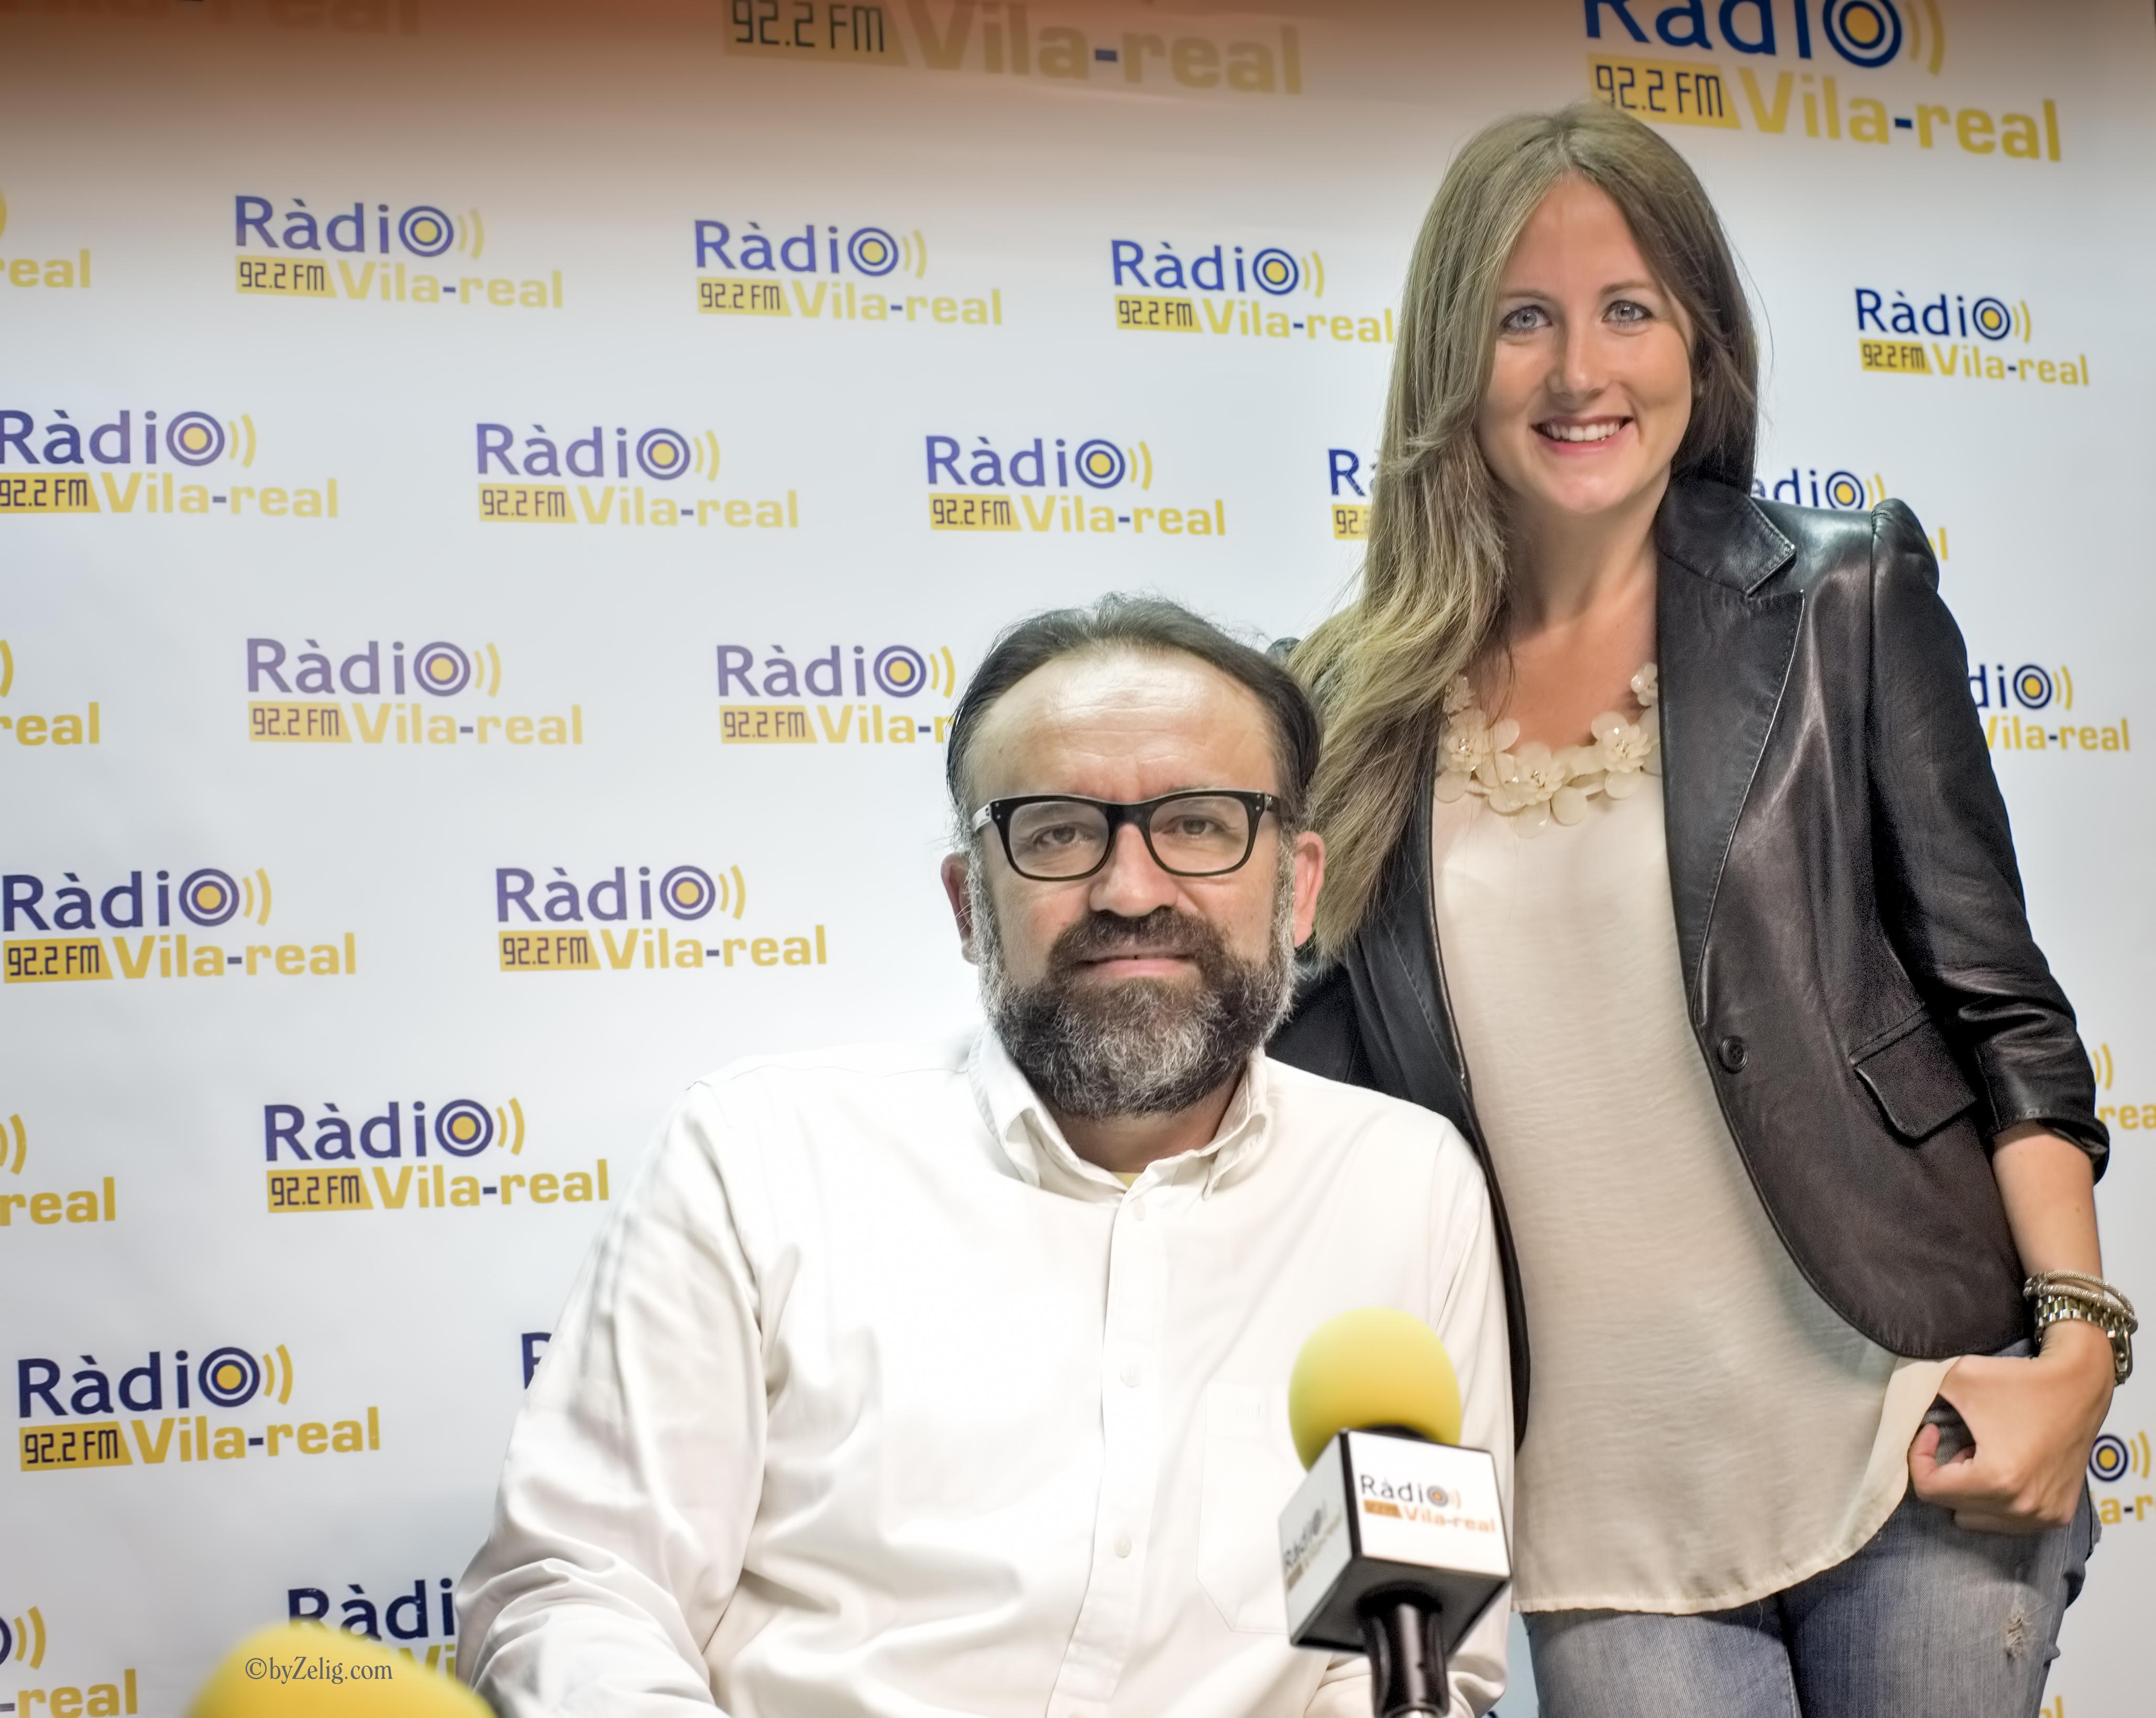 Esports Radio Vila-real. Programa del 16 de octubre 2017